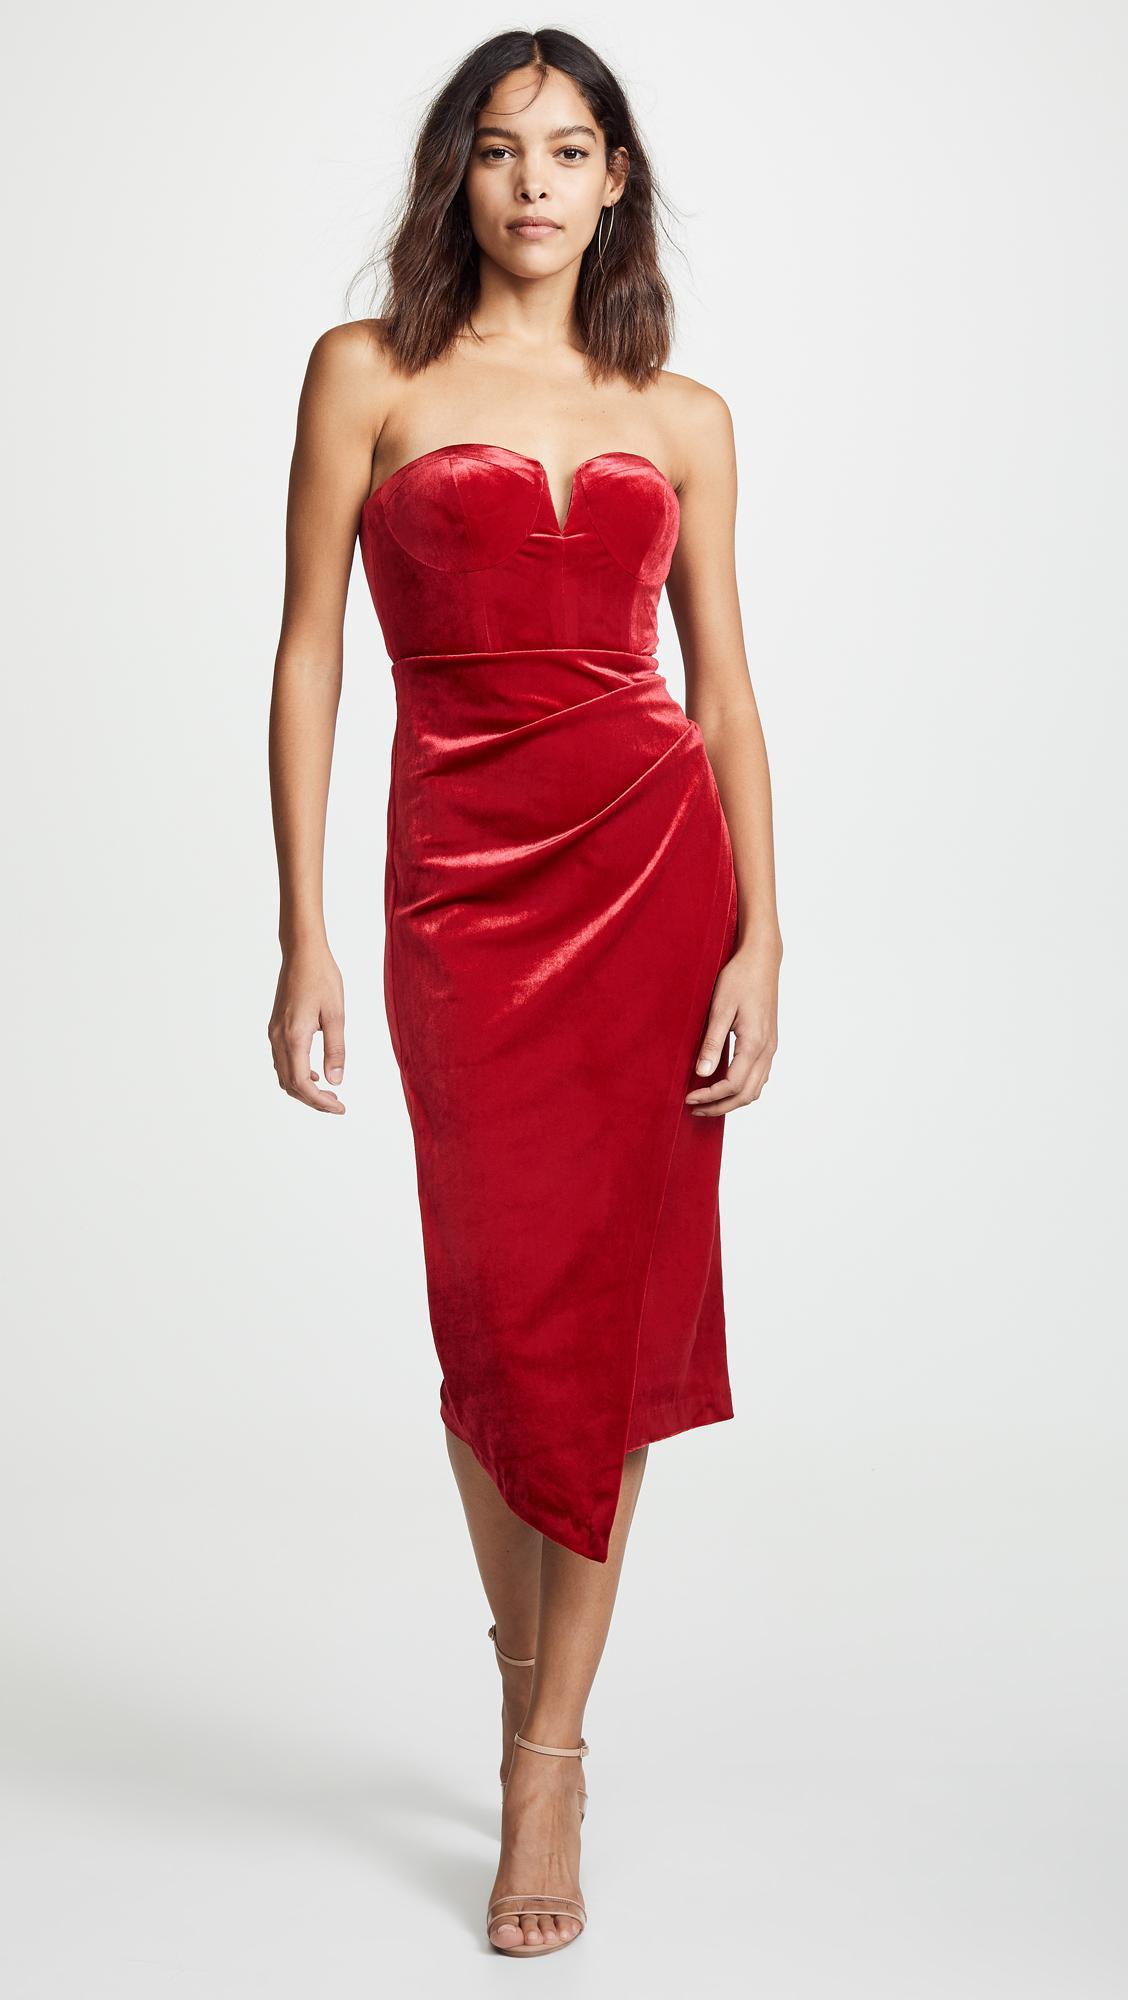 Lyst - Yumi Kim Velvet Allure Dress in Red 0bdb4d5ee